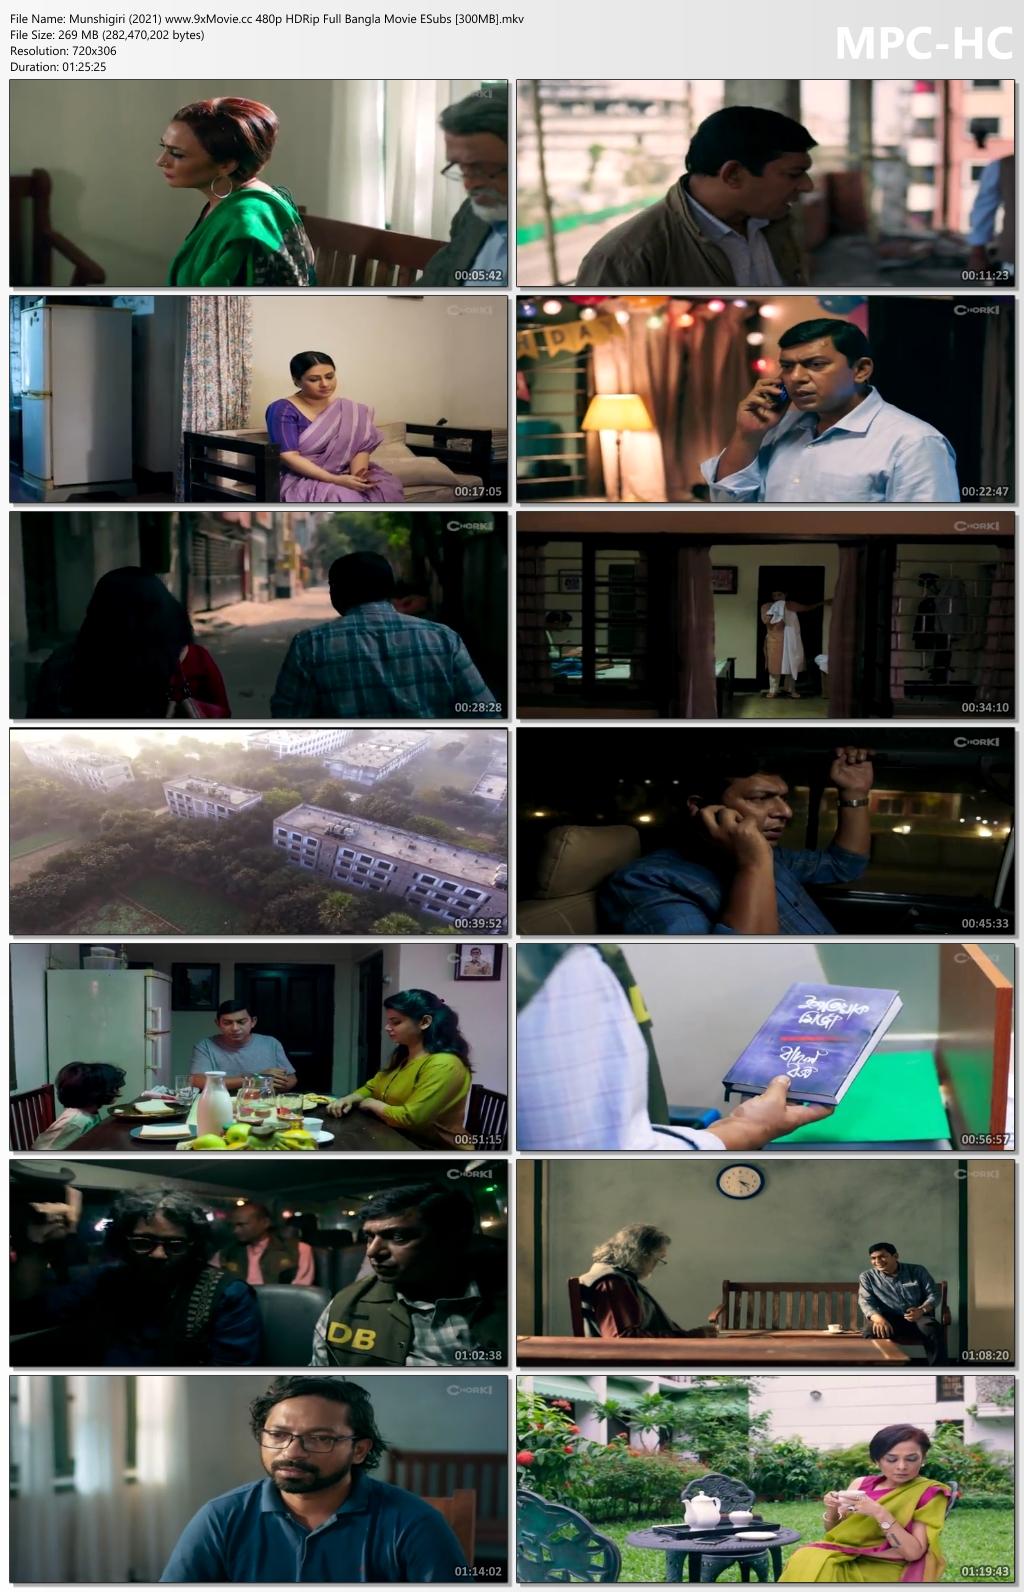 Munshigiri-2021-www-9x-Movie-cc-480p-HDRip-Full-Bangla-Movie-ESubs-300-MB-mkv